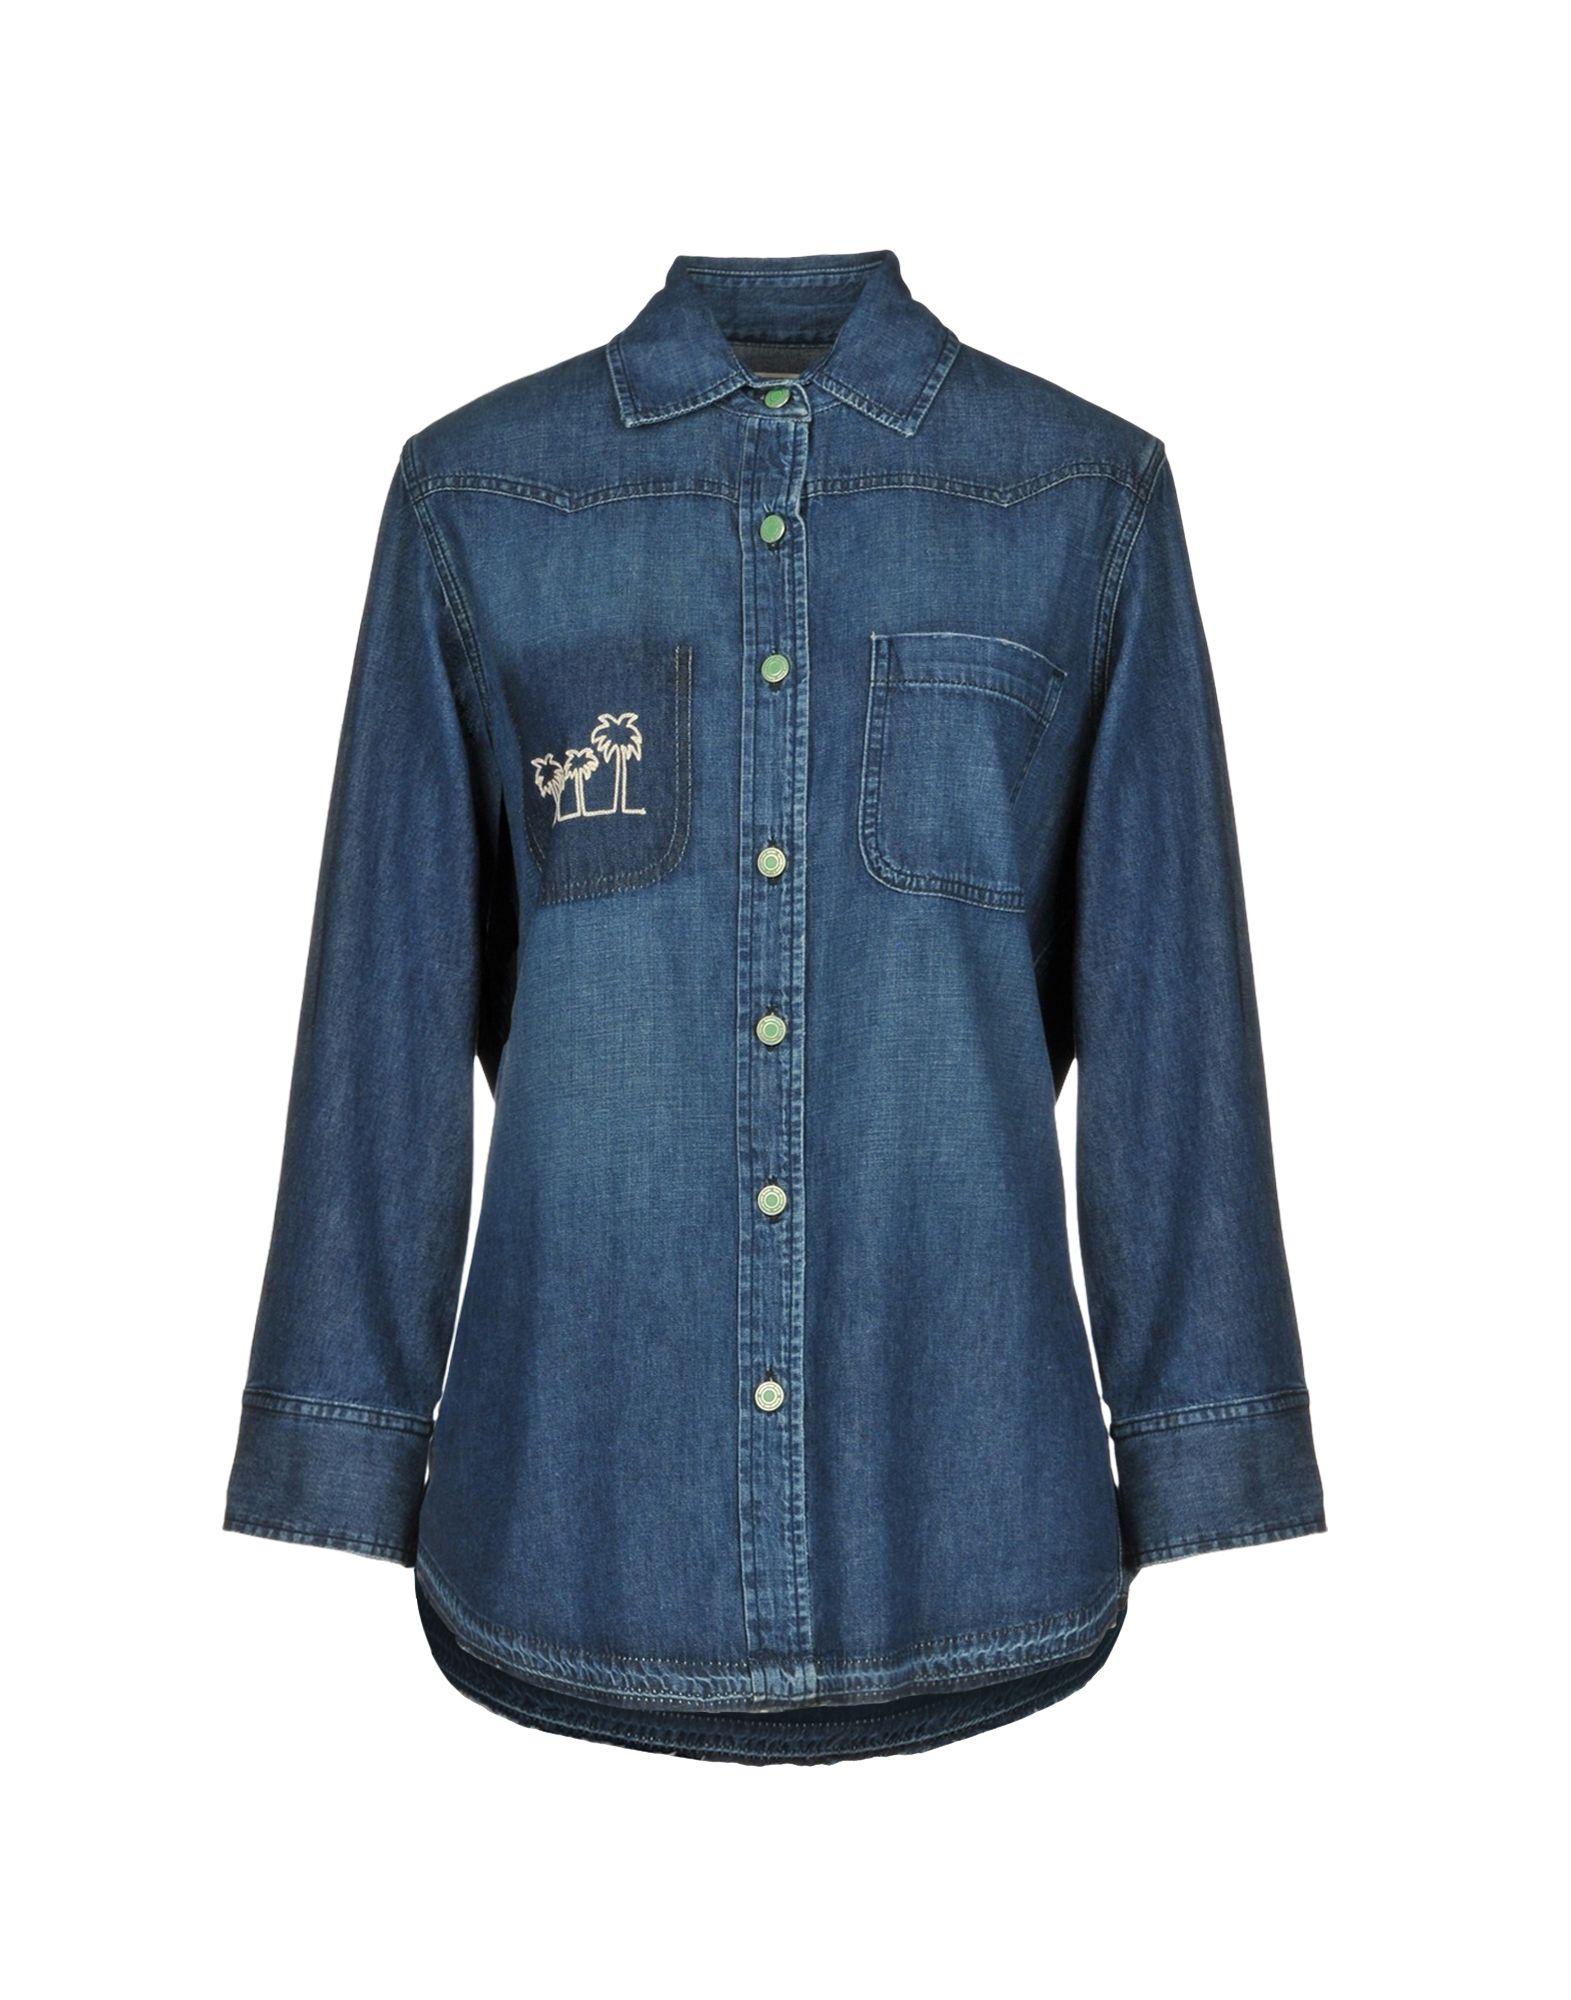 SANDRINE ROSE Джинсовая рубашка